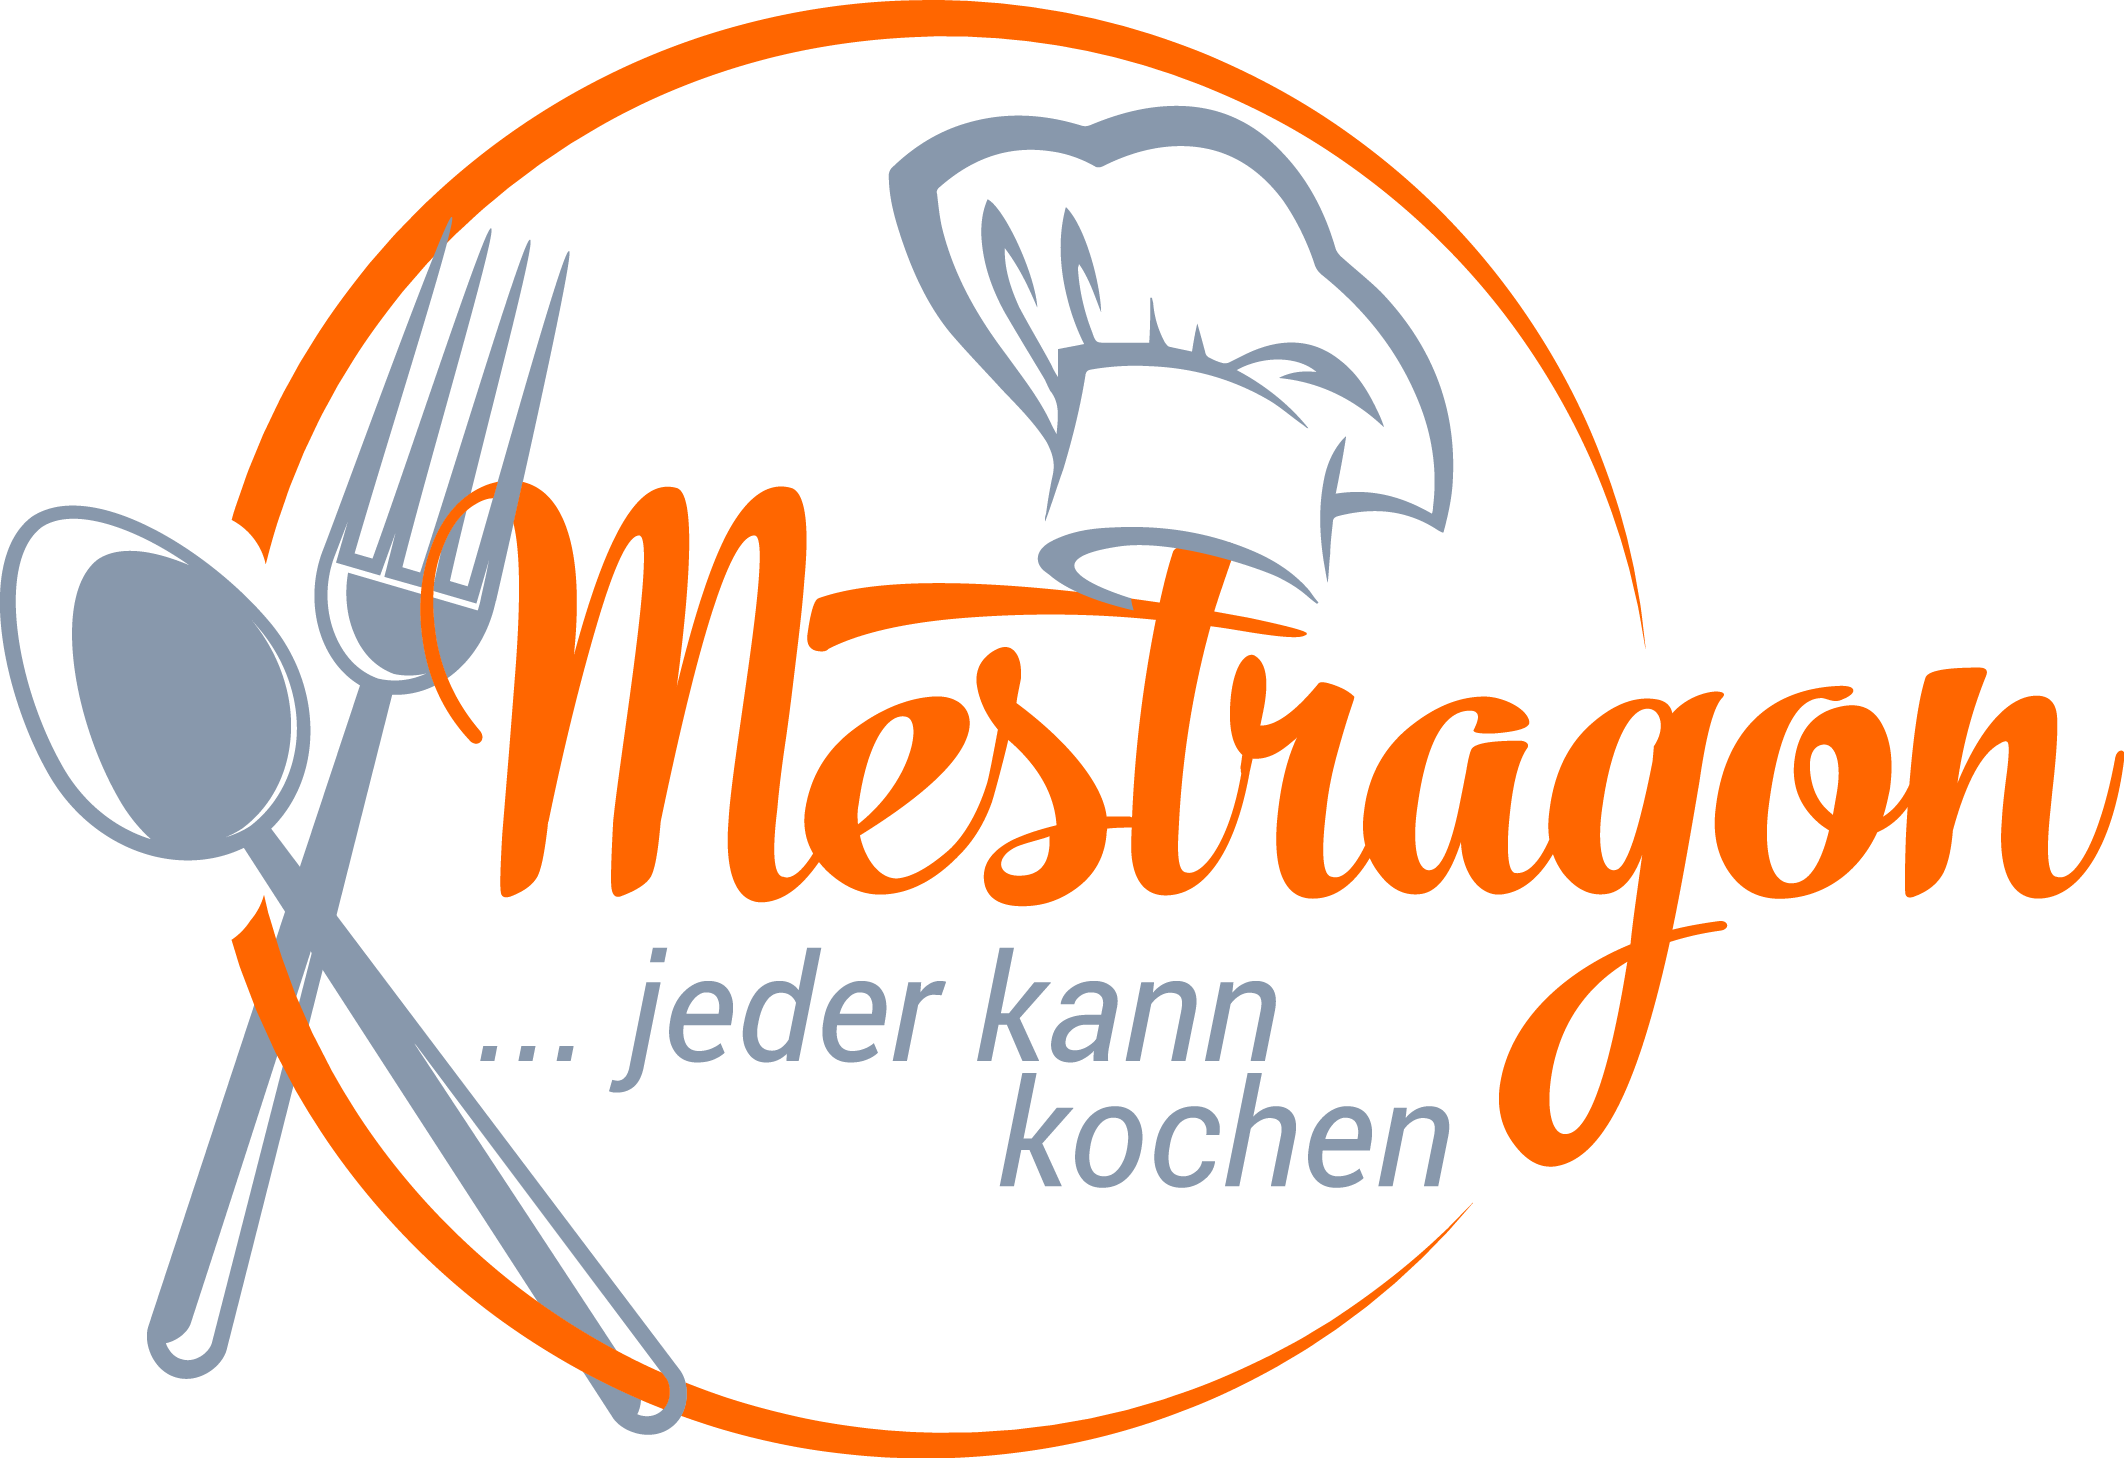 Mestragon